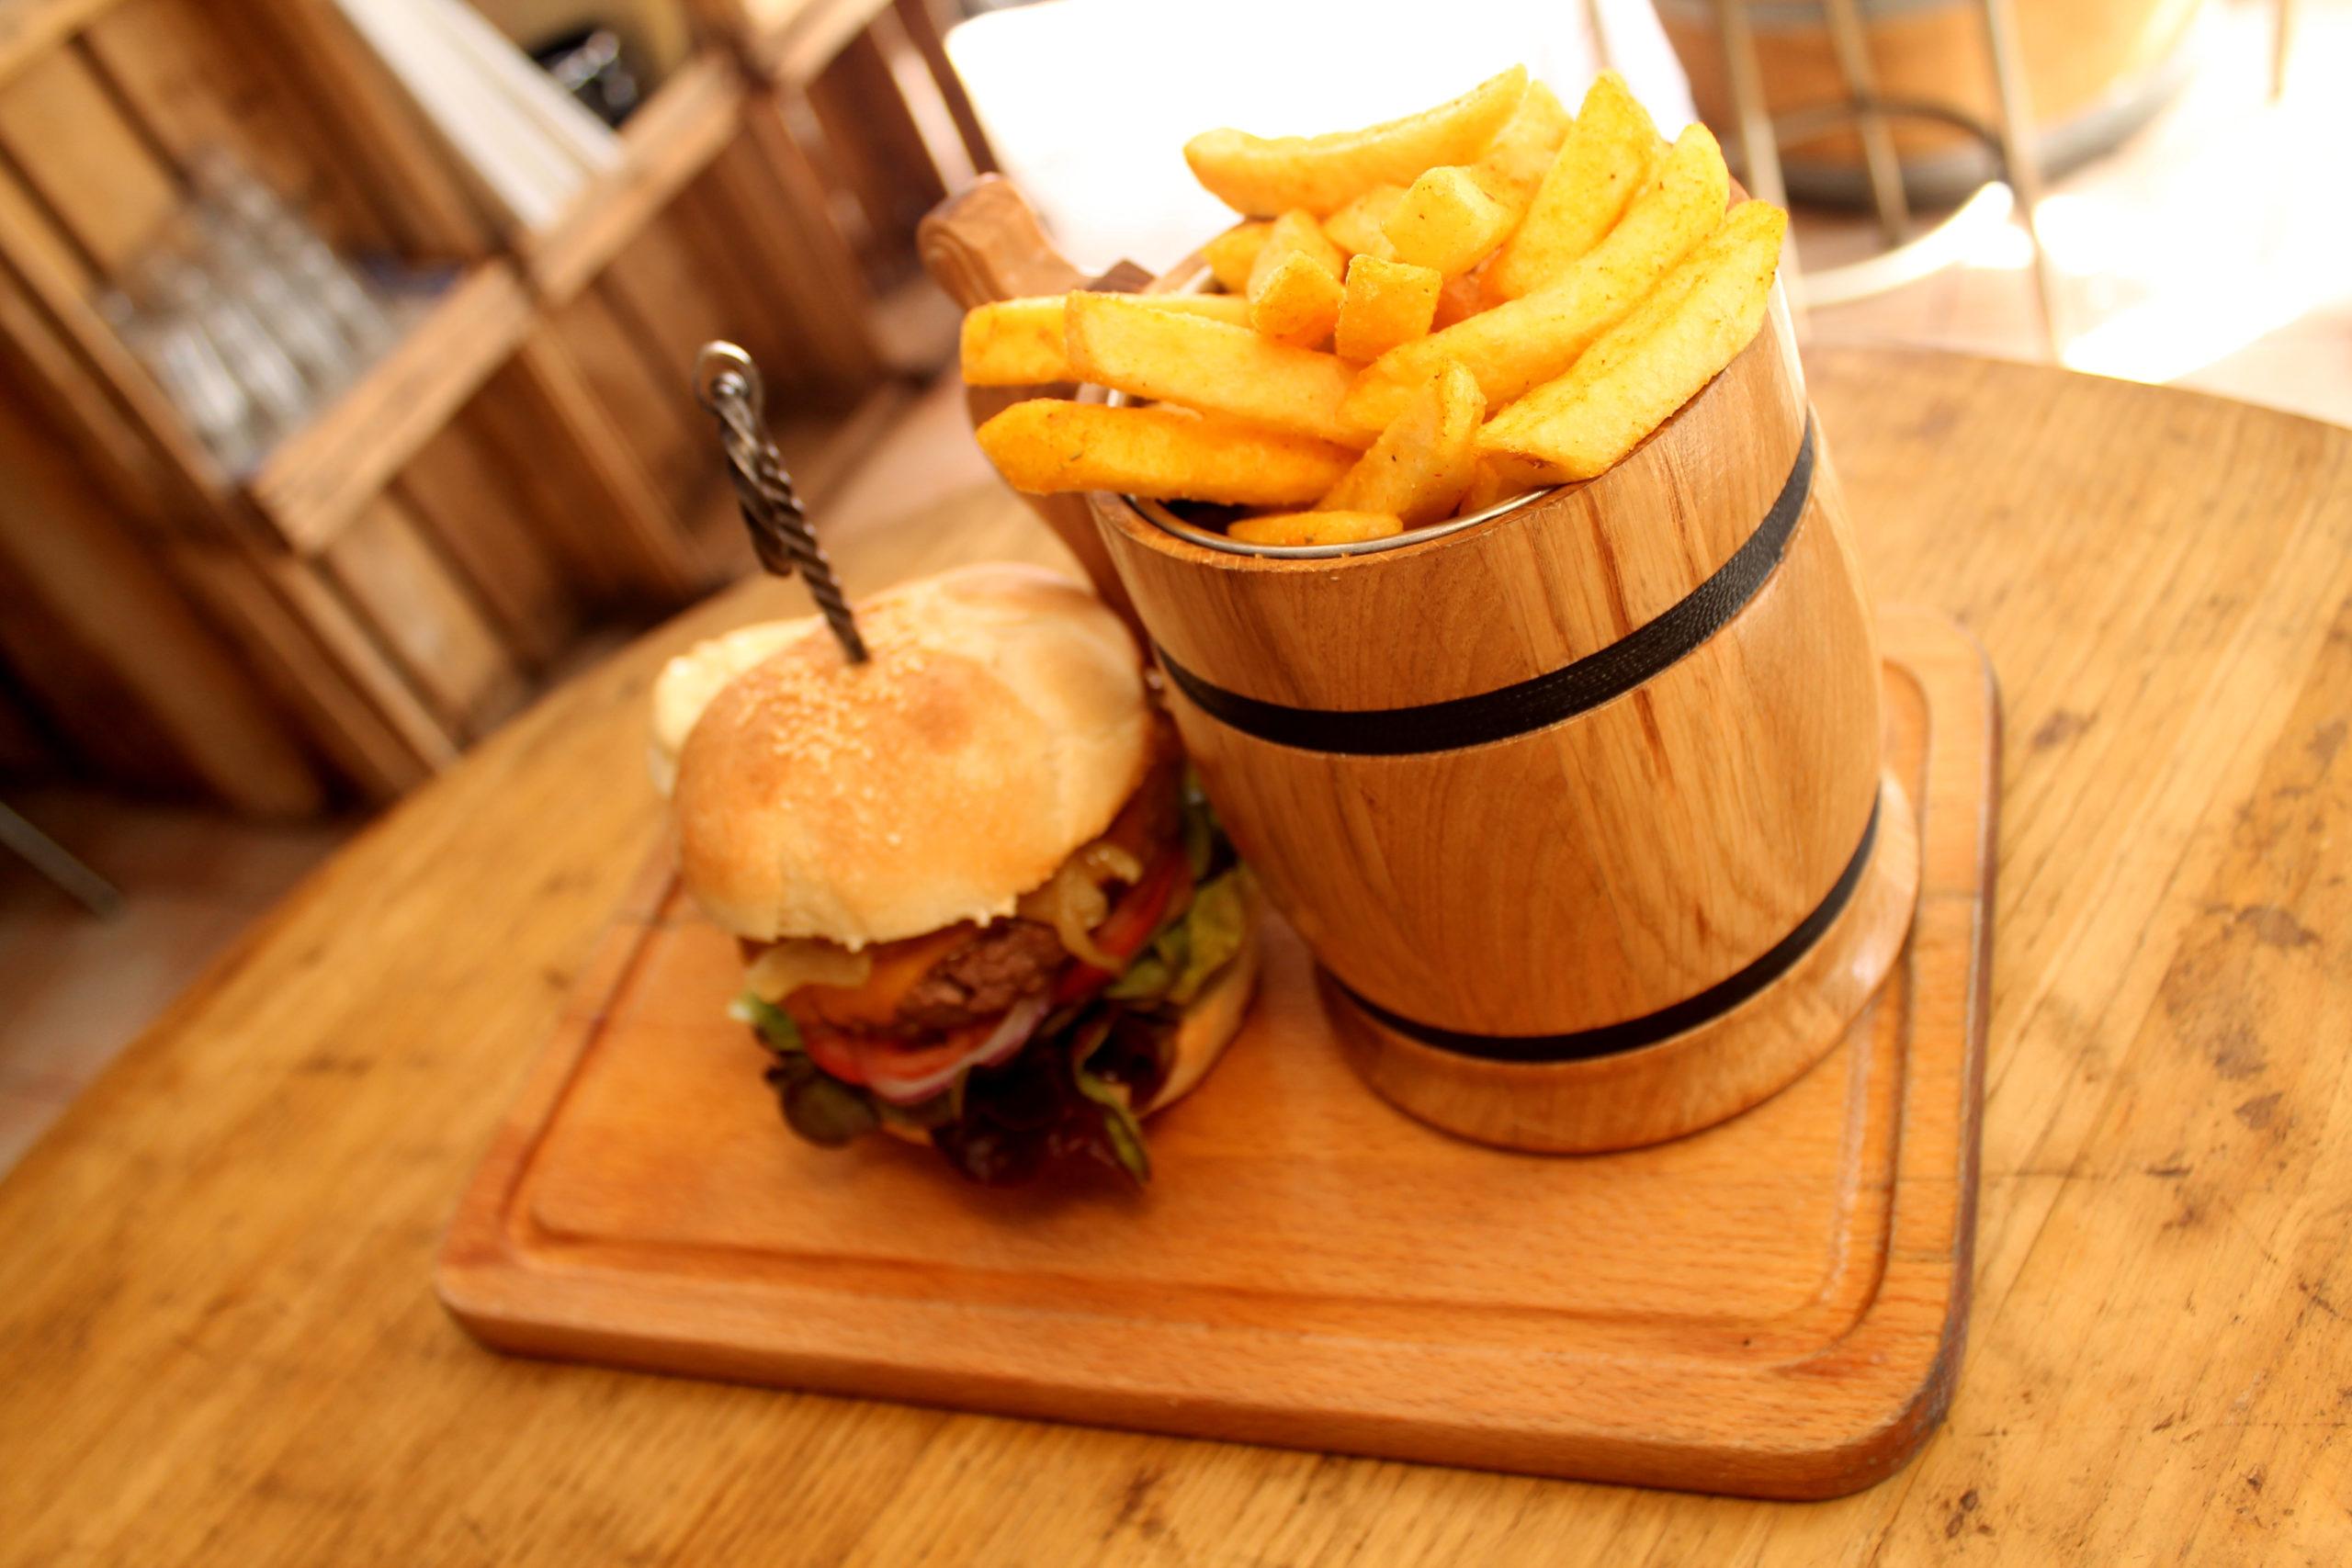 Menu Burger 2 - Prise par Nob Guérin